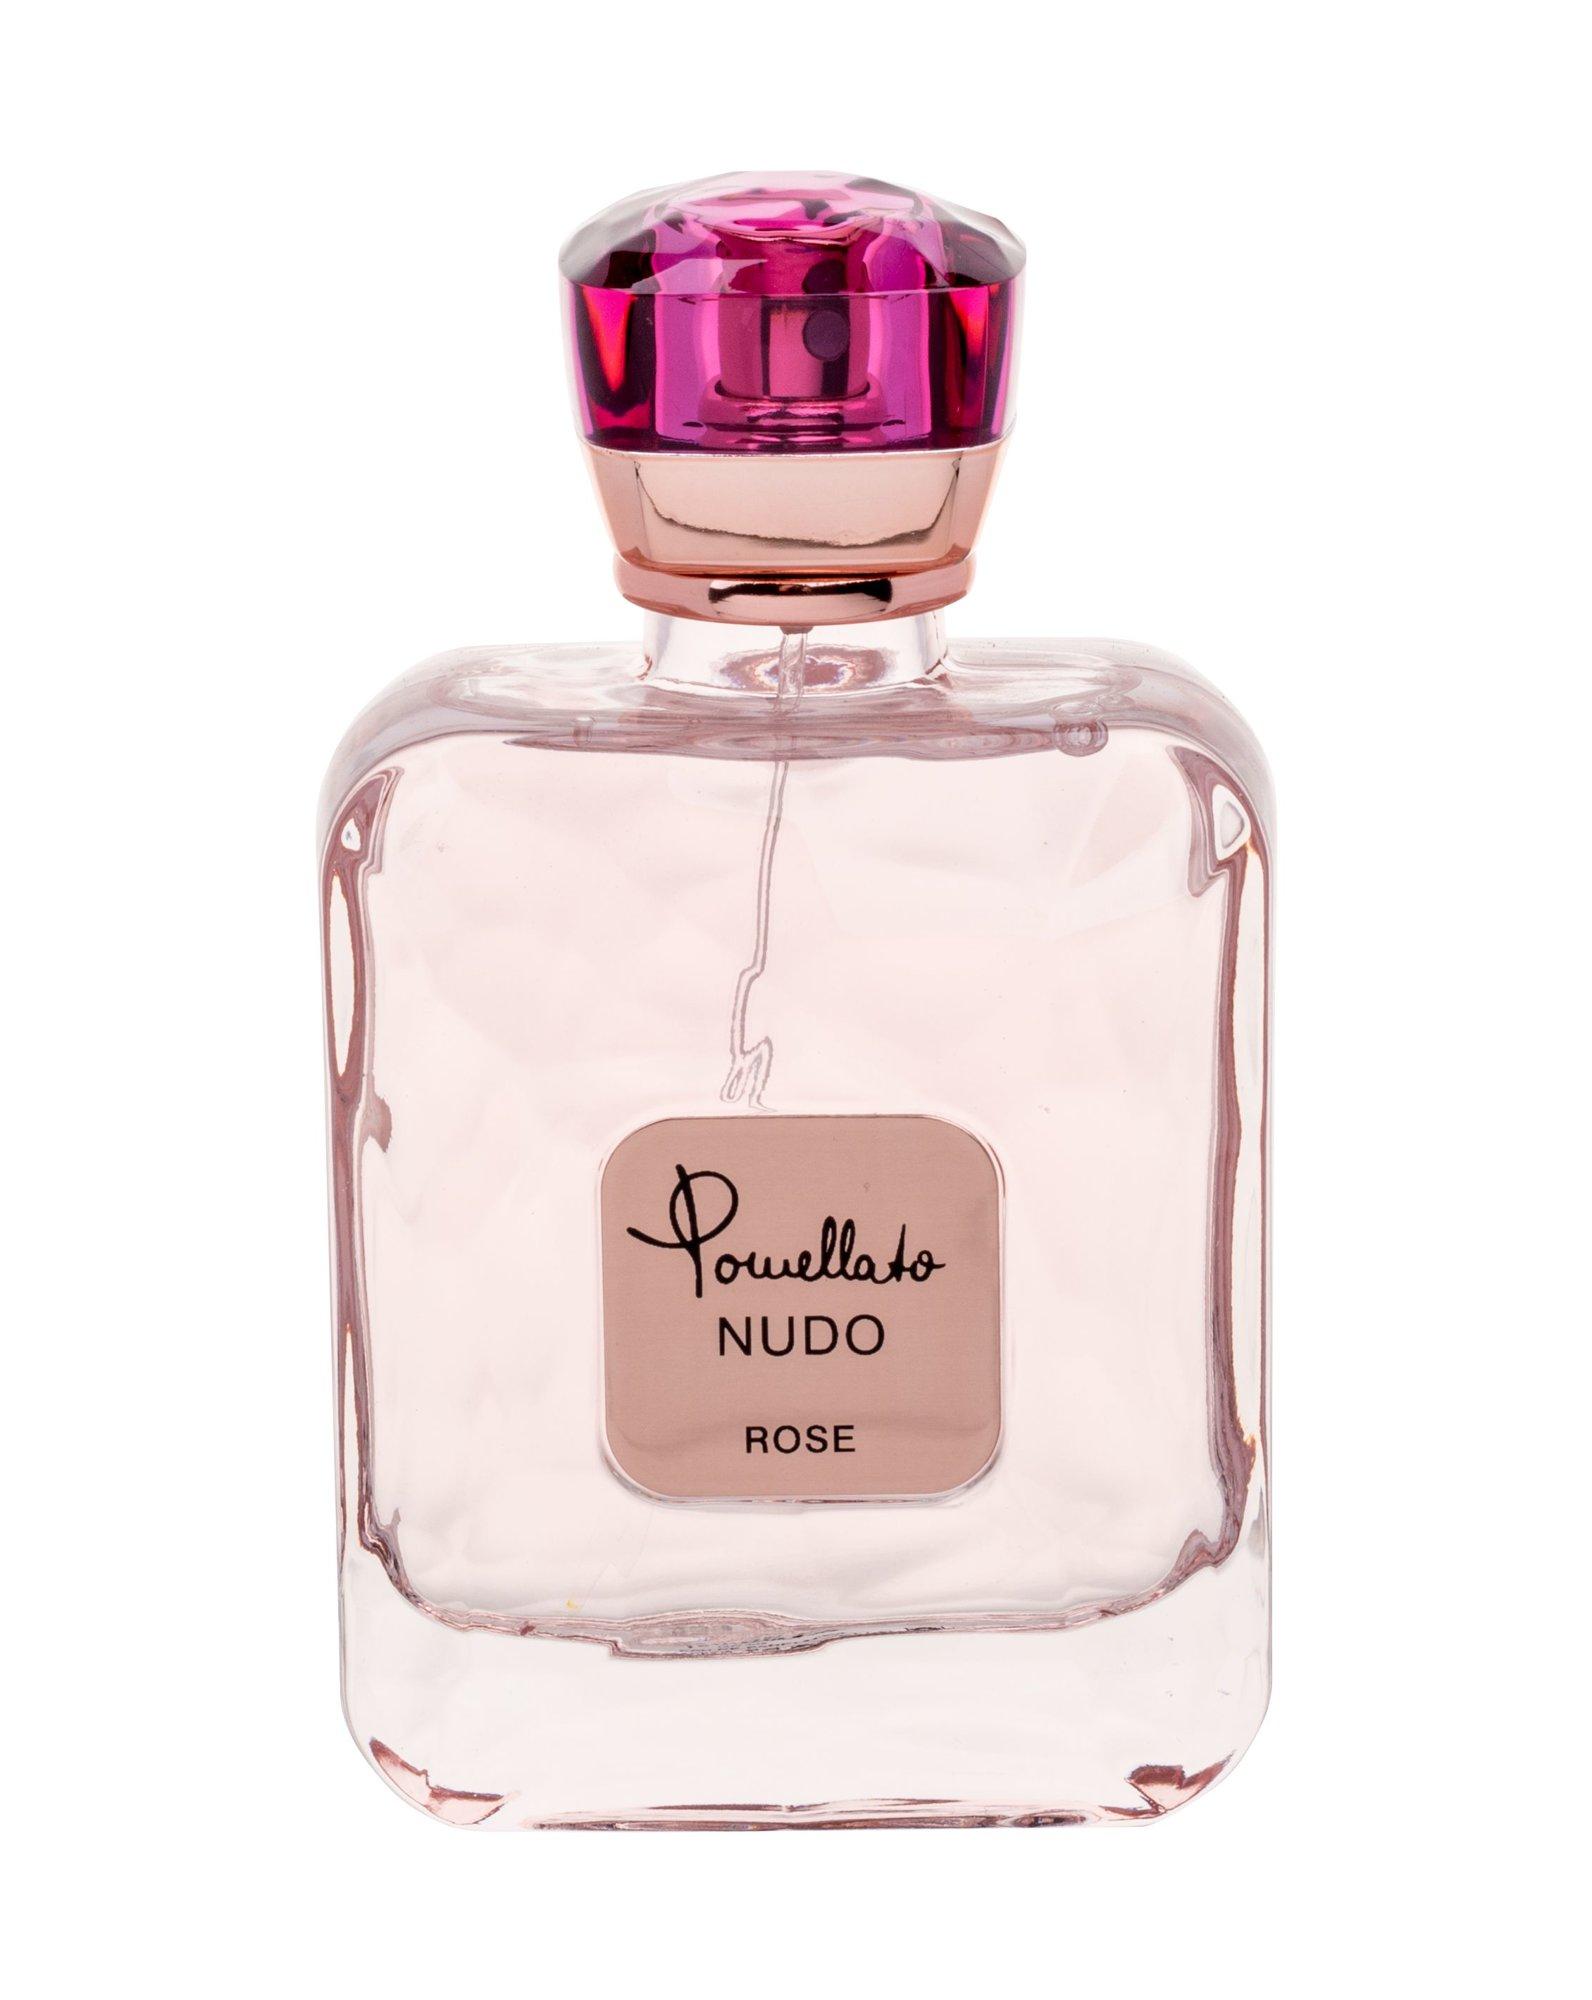 Pomellato Nudo Rose, Parfumovaná voda 90ml